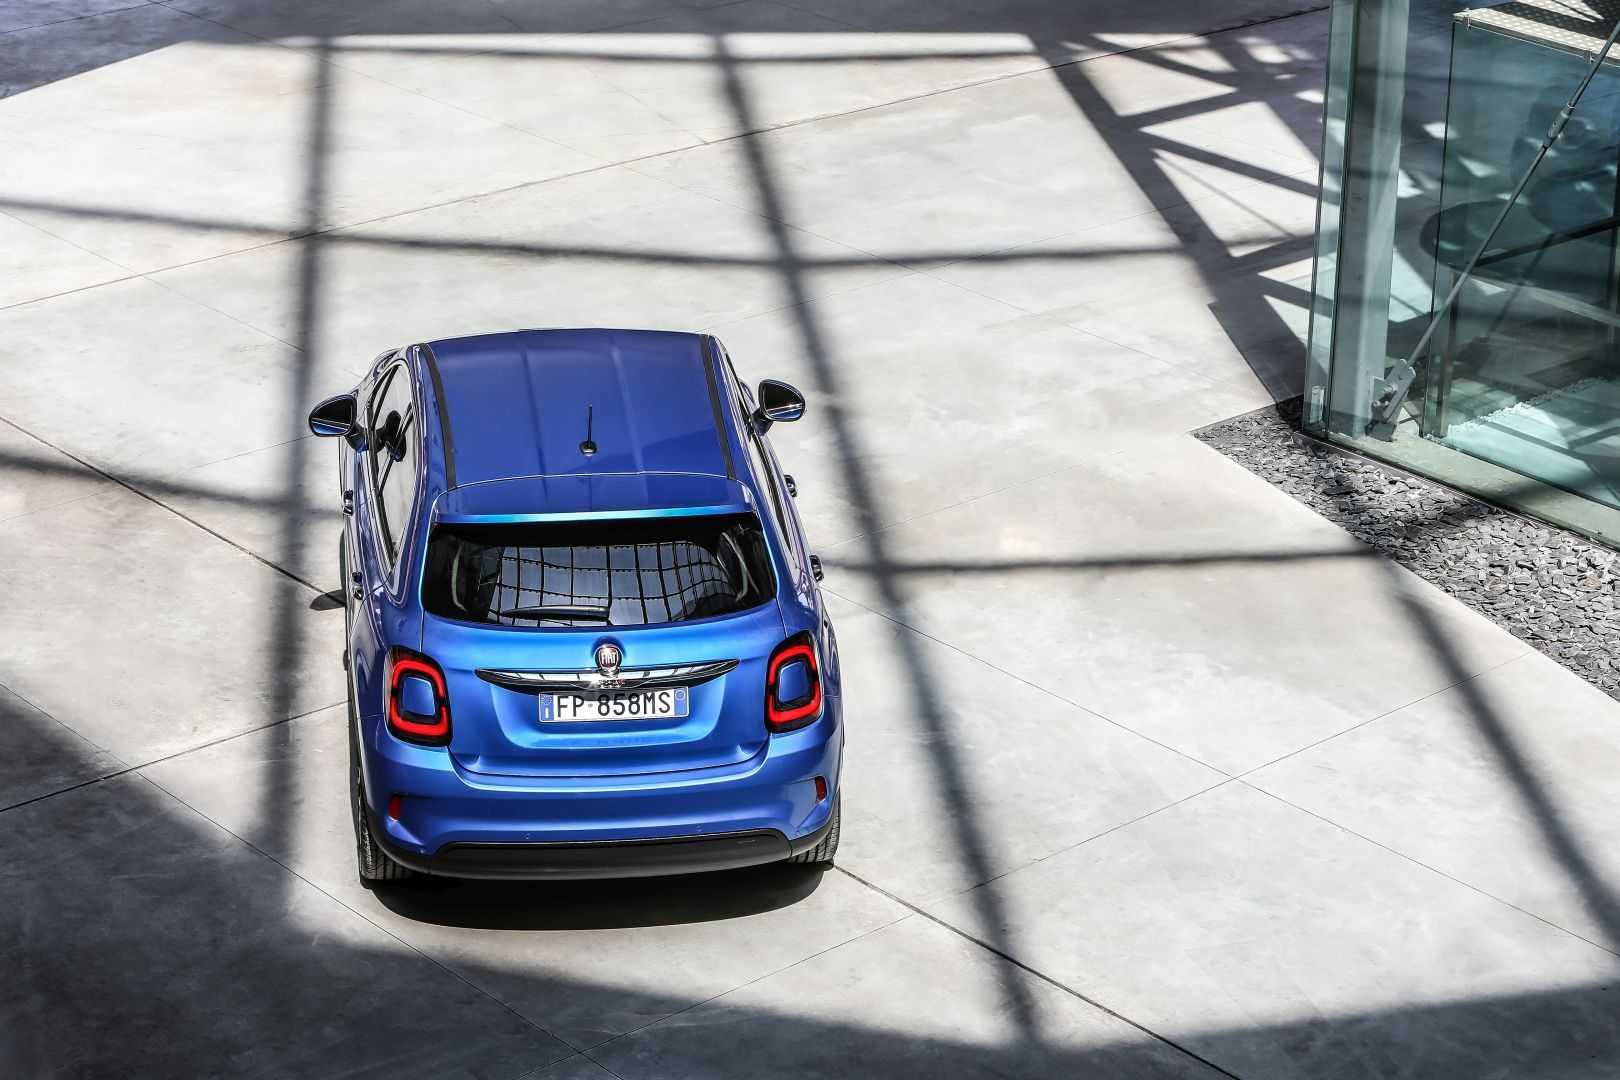 Fiat 500x 2019 – рестайлинг мини-кроссовера фиат